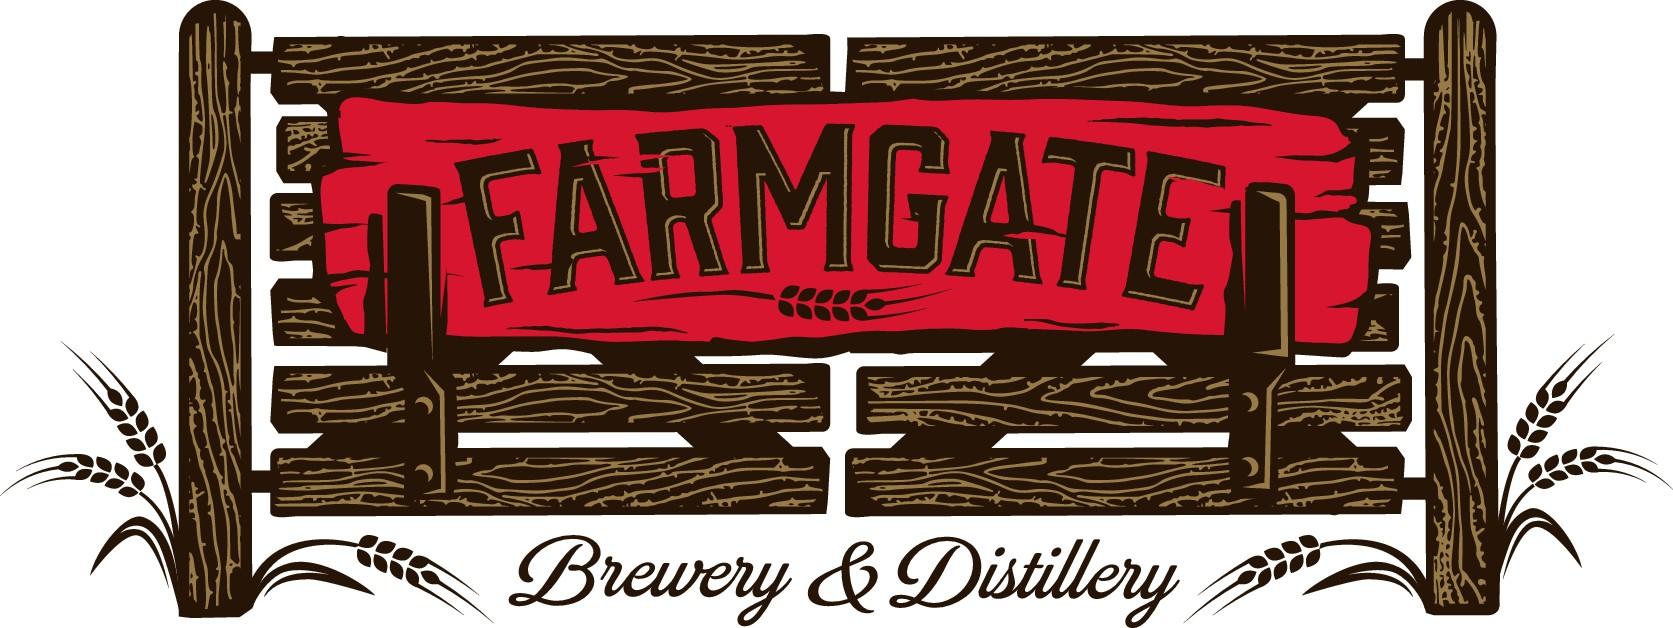 Startup distillery needs outstanding logo